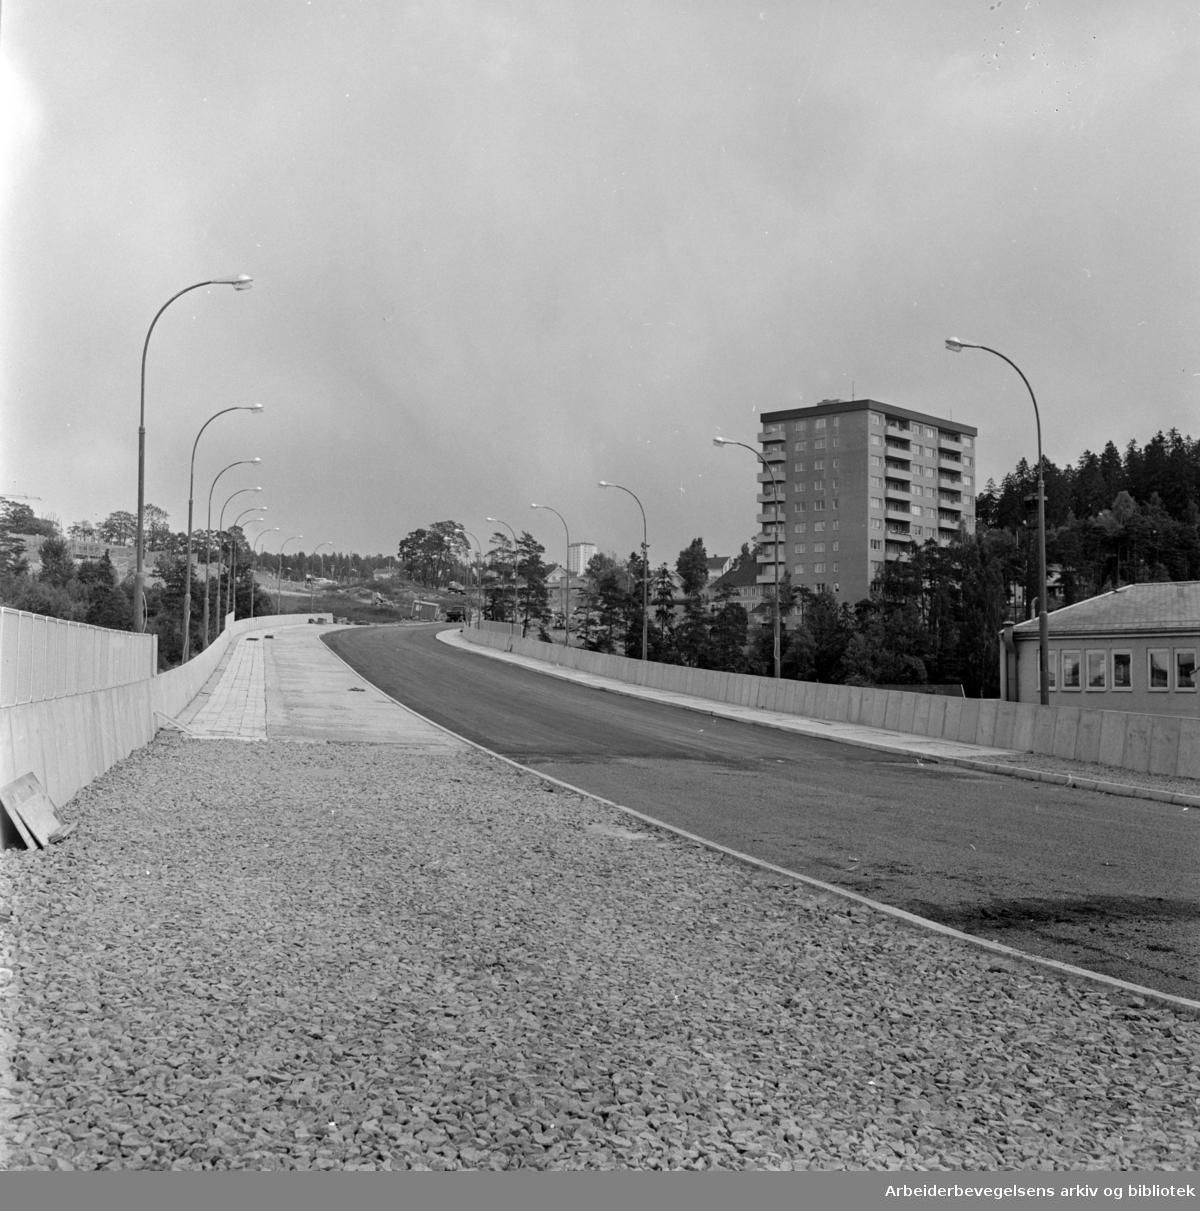 Tveita bru klar for trafikk. Juli 1964